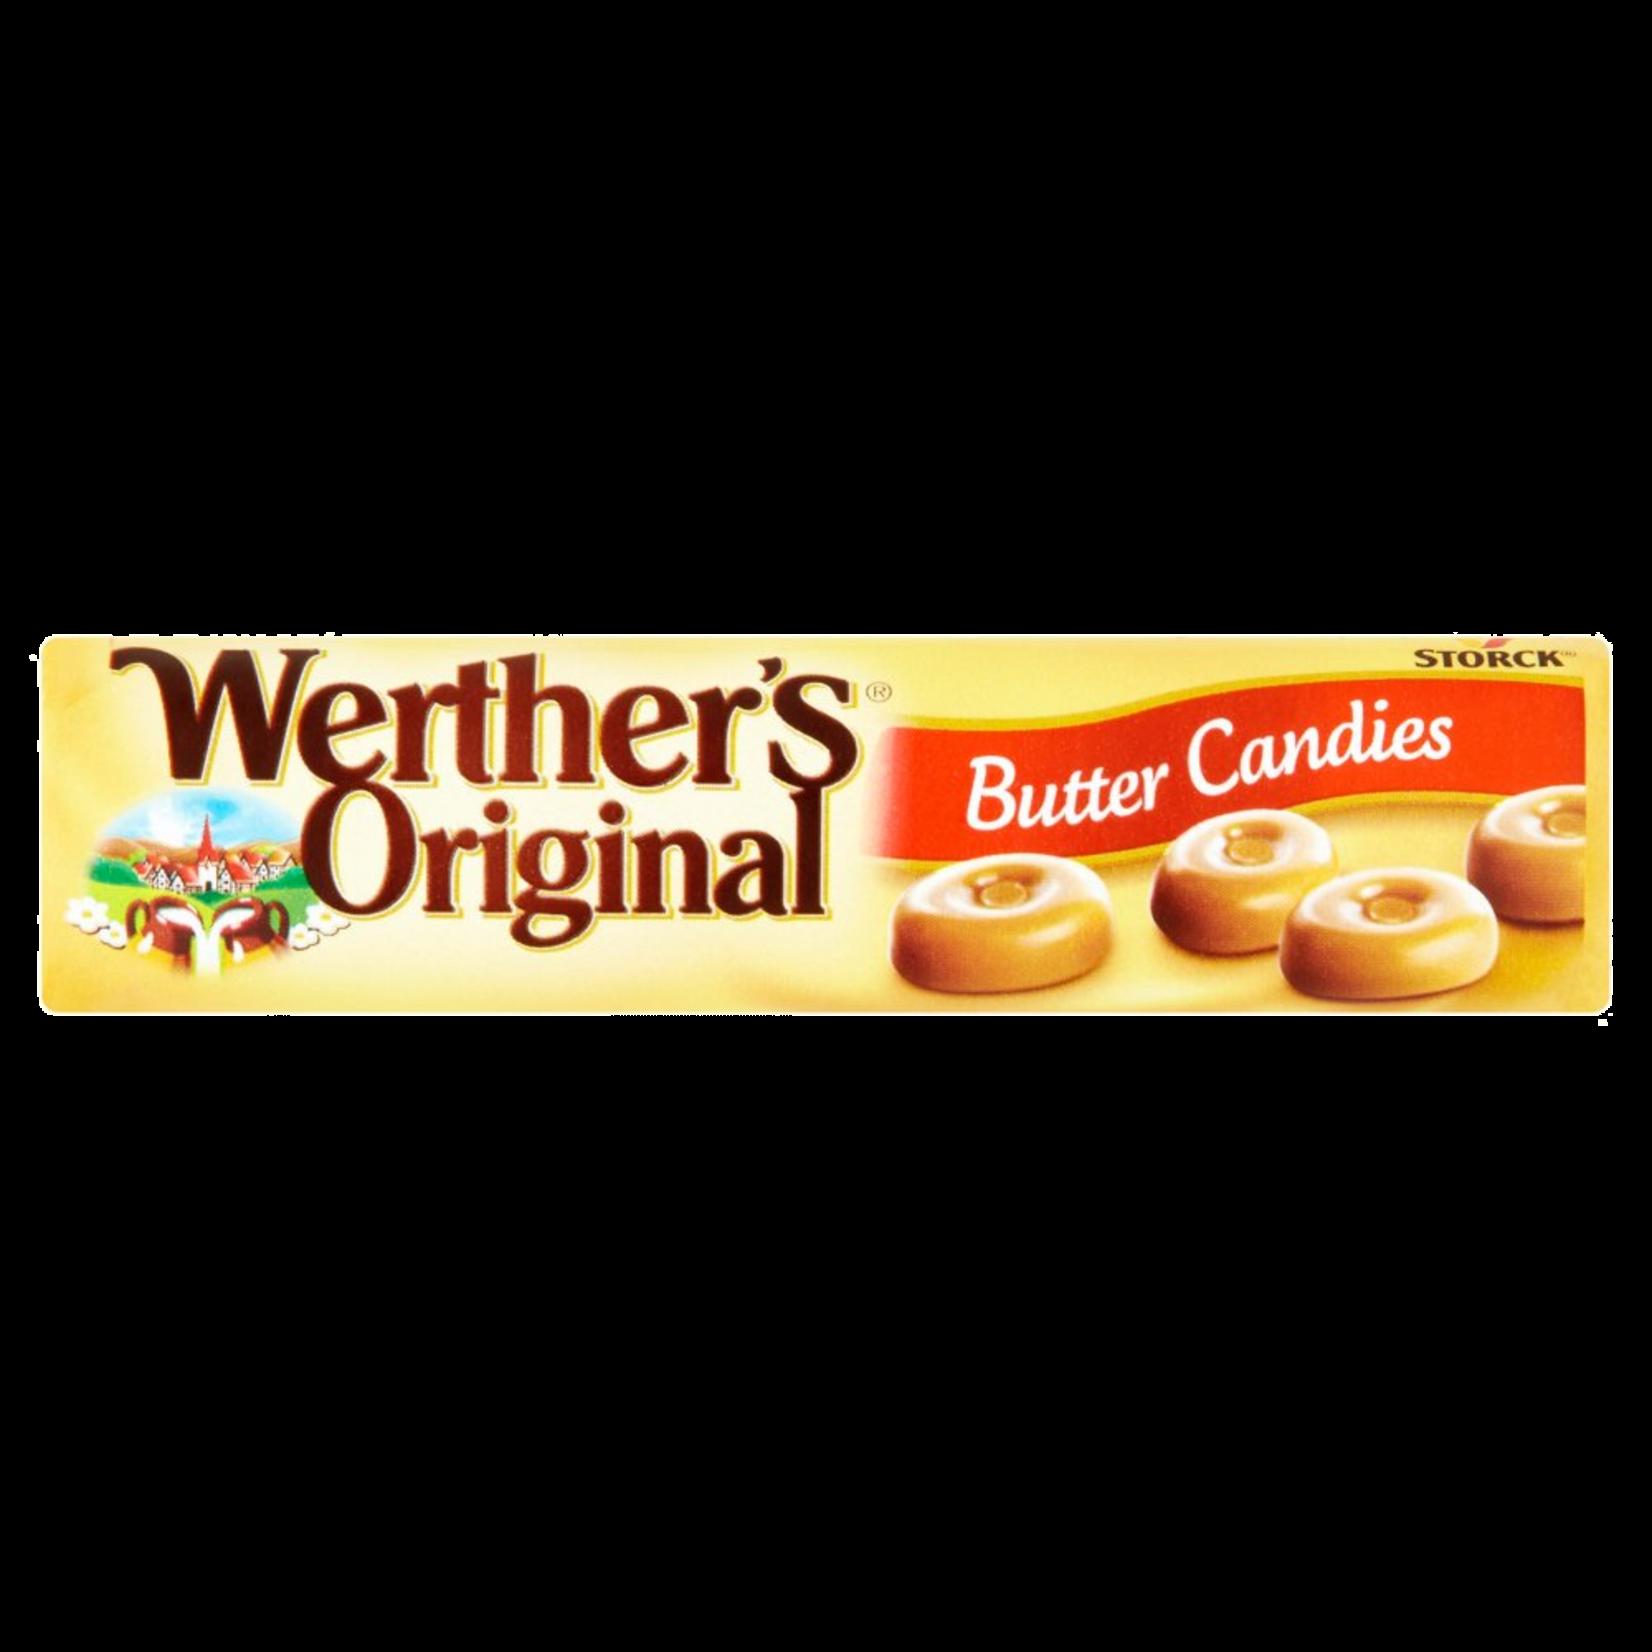 Werther's Original Butter Candies, 50g